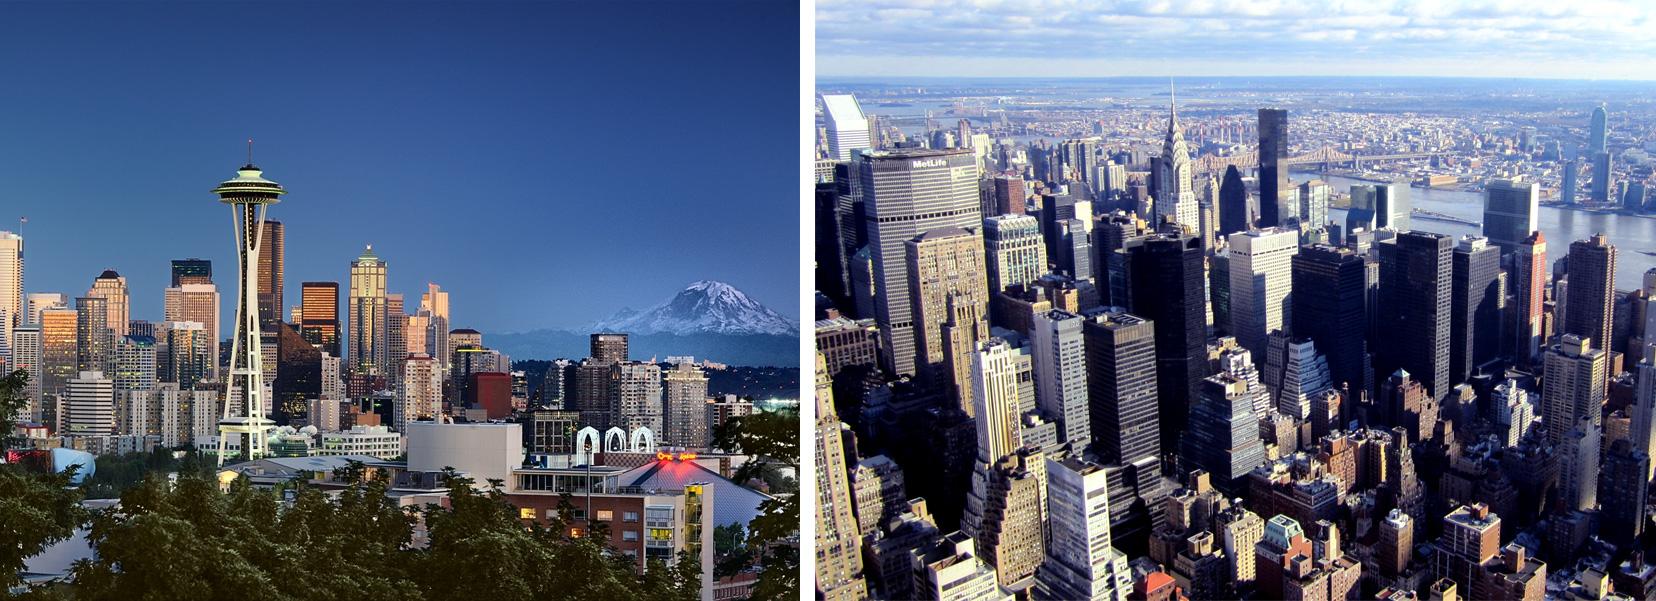 seattle versus new-york